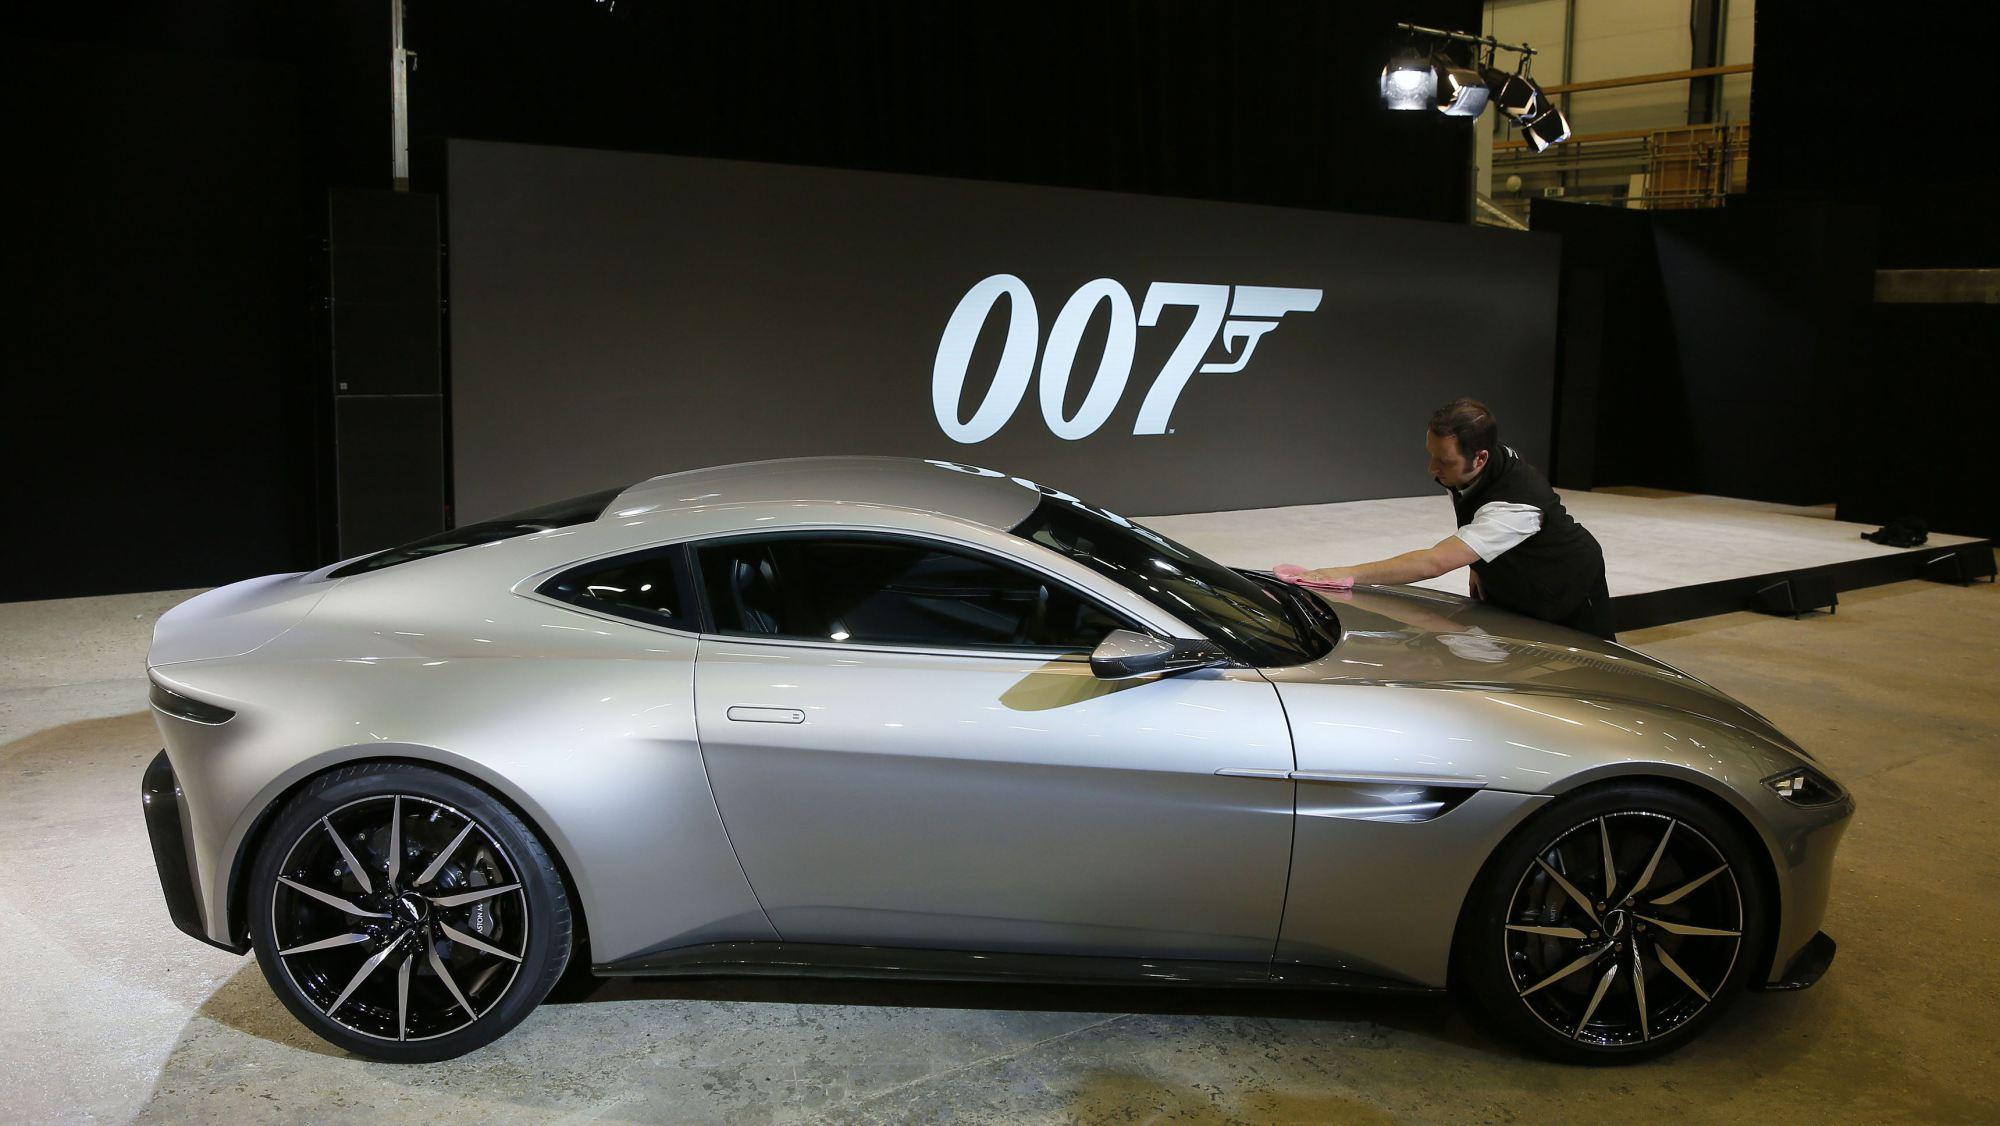 Aston Martin DB10 nowy samoch³d Jamesa Bonda Lu